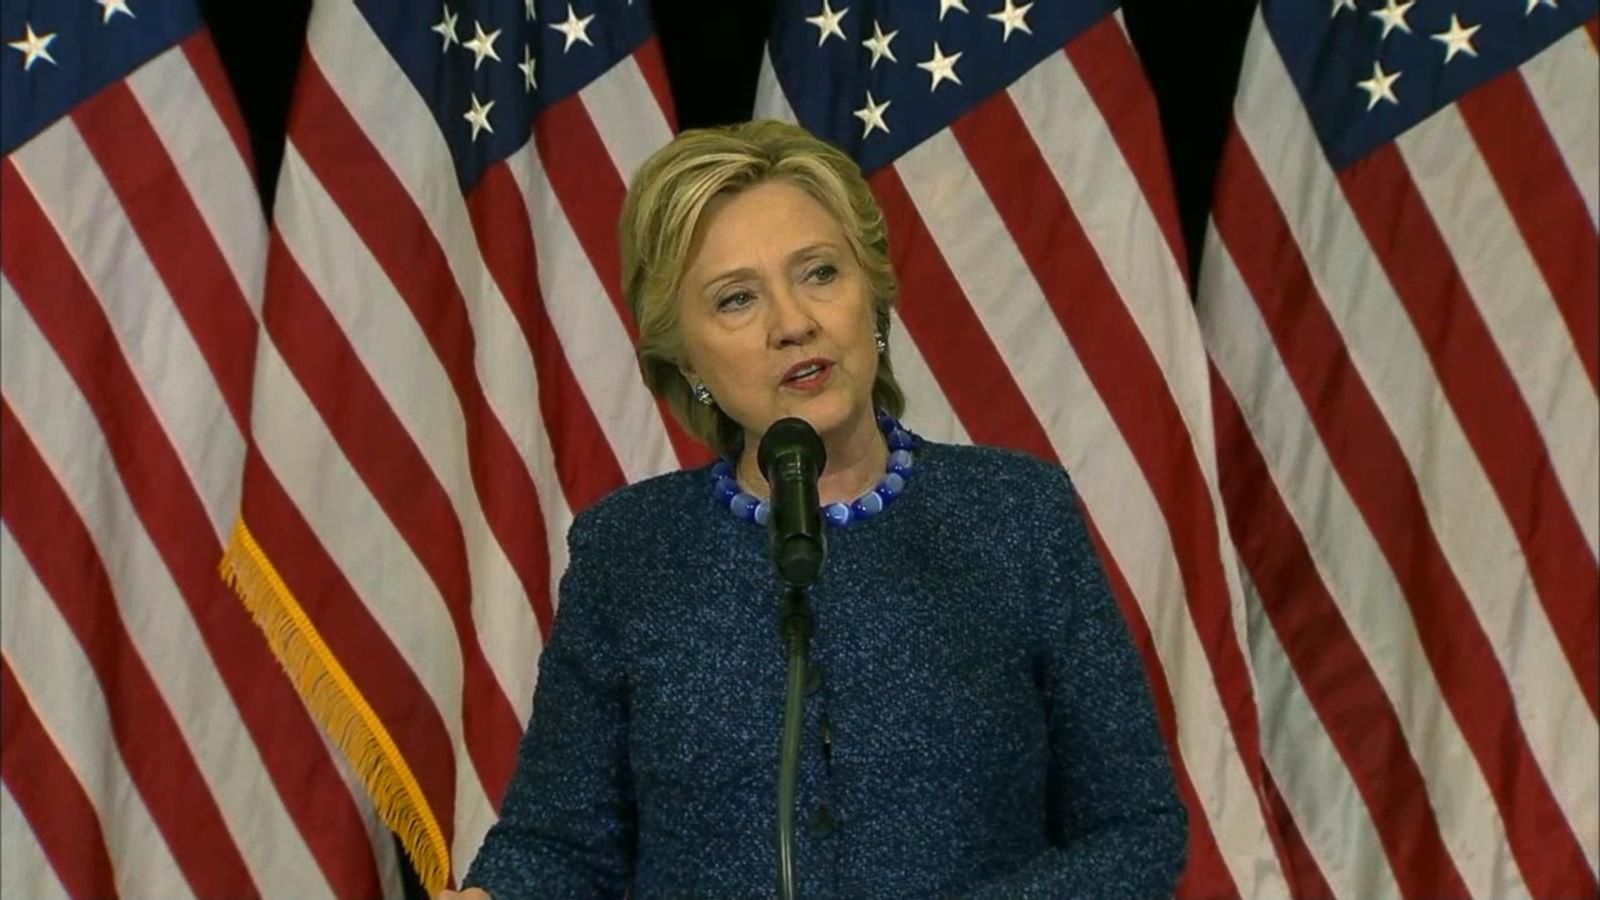 The Democratic nominee addressed the public this evening.